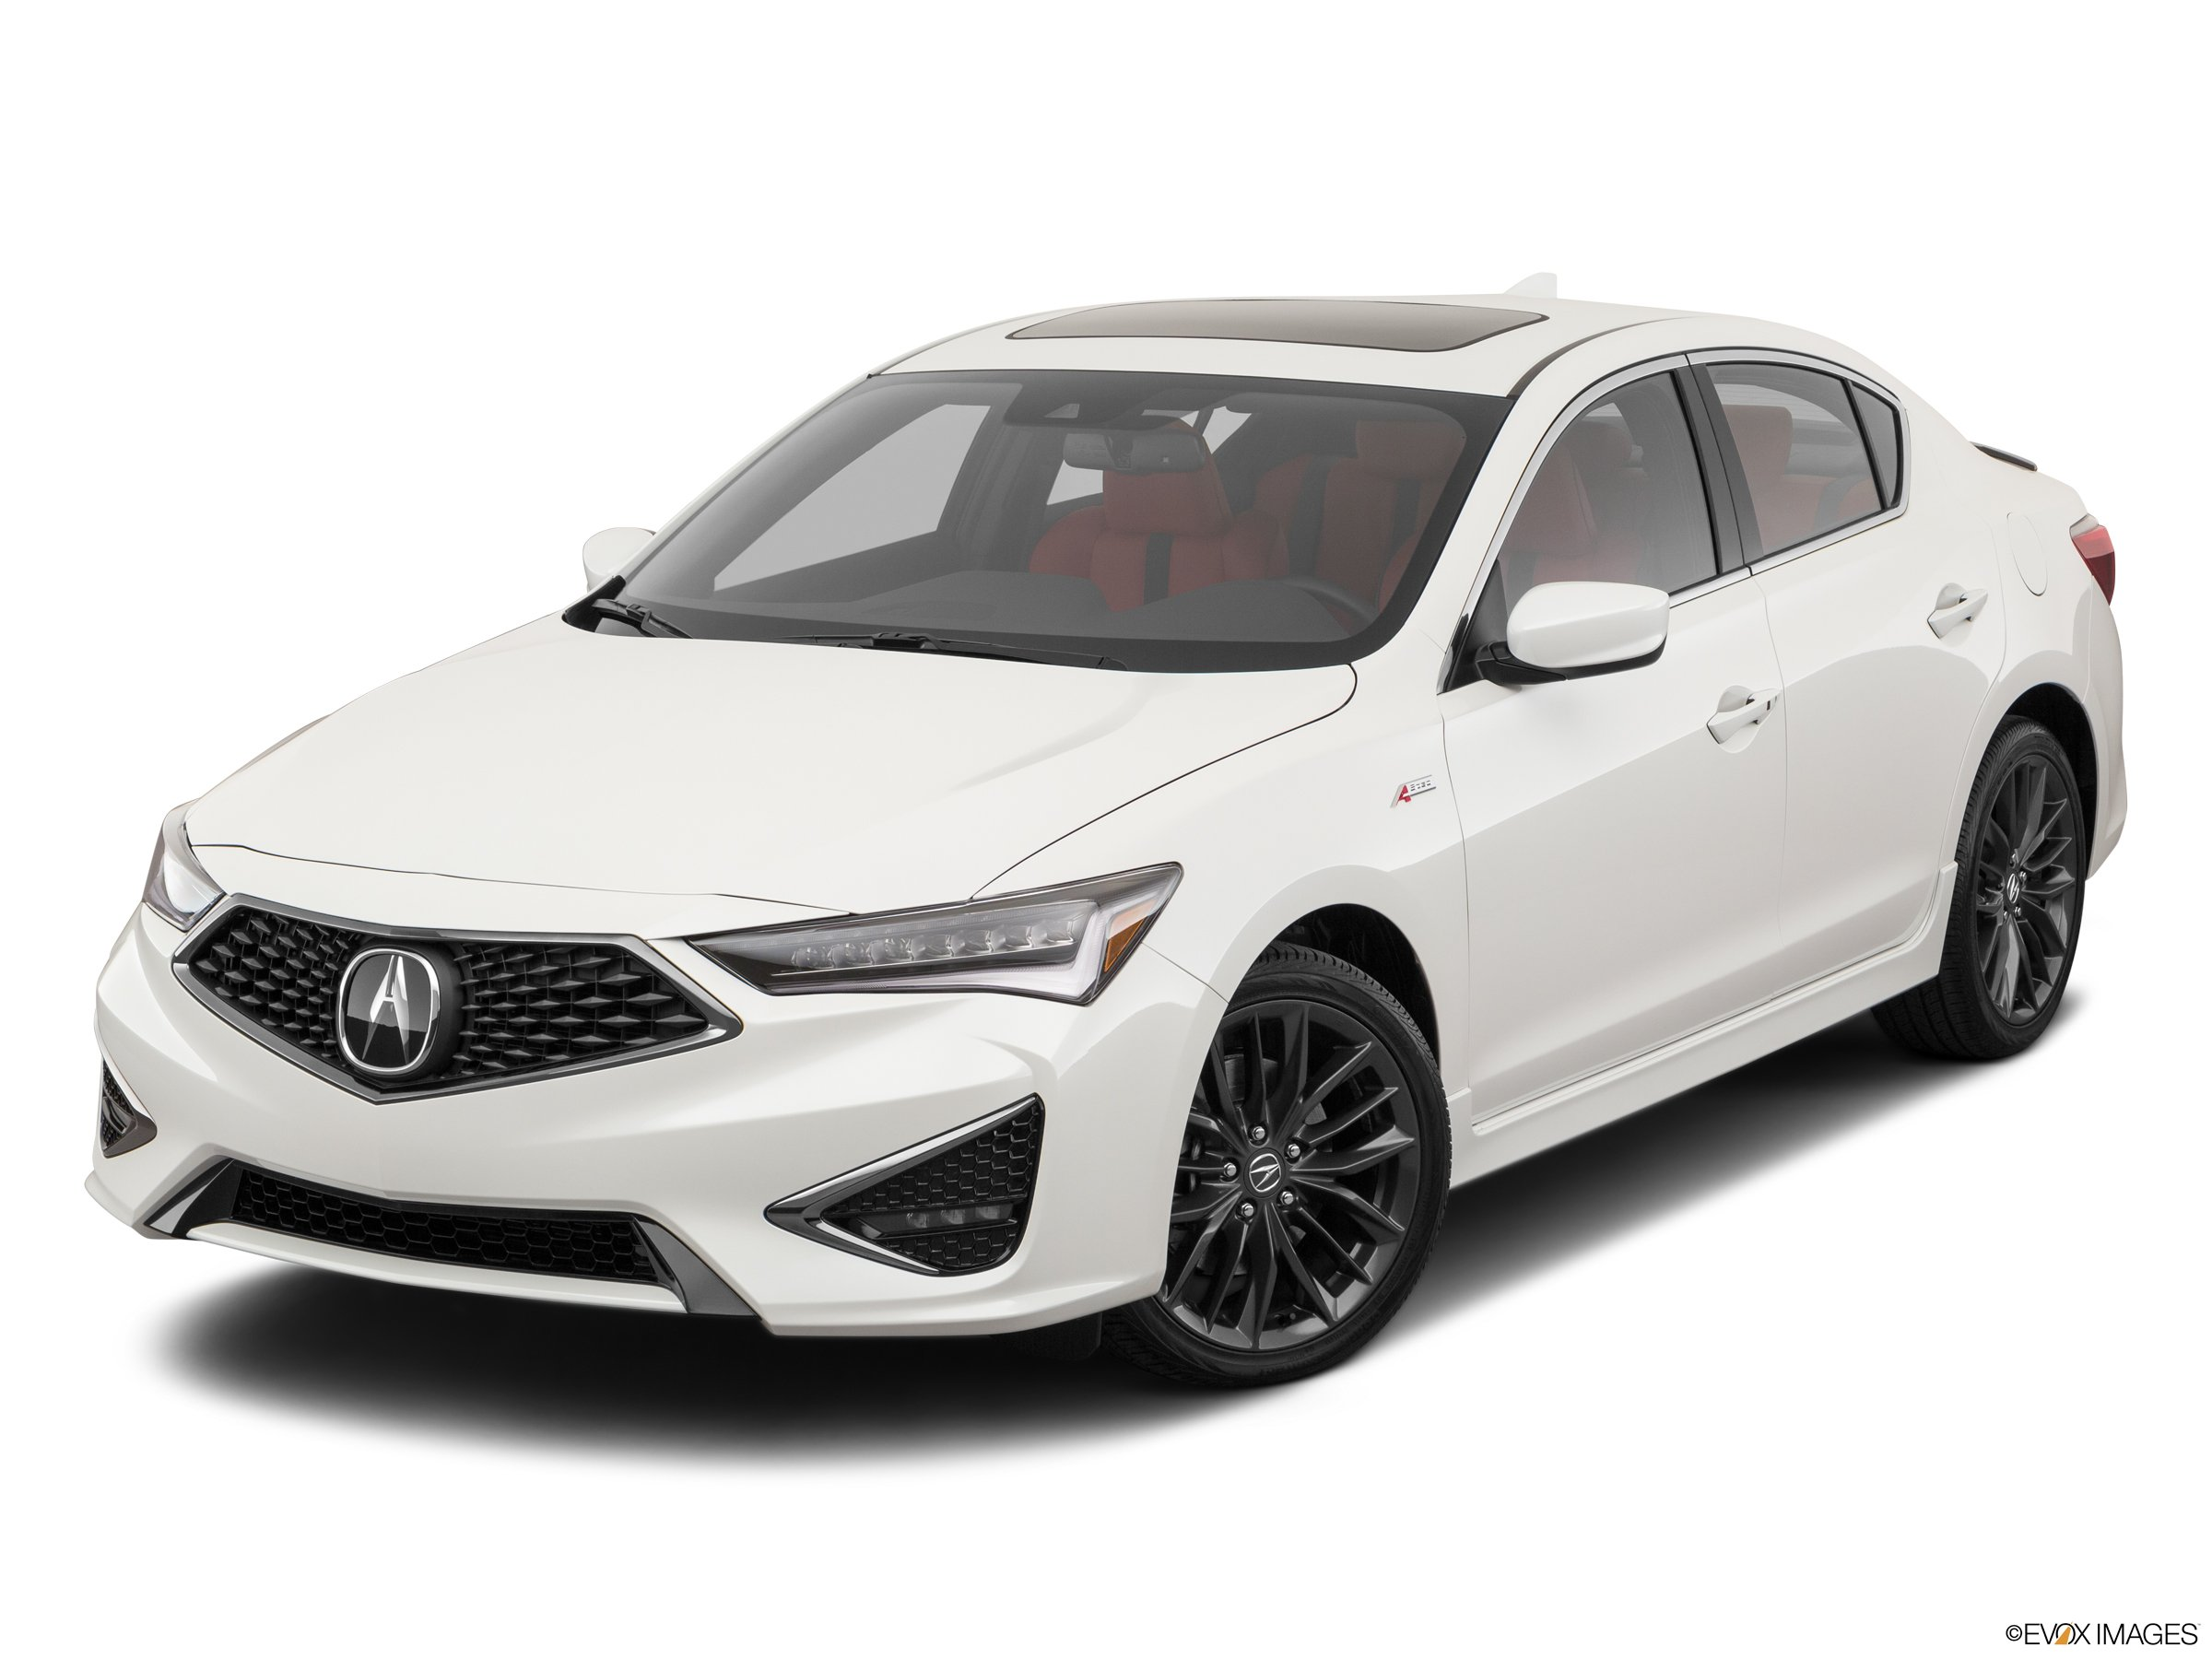 2020 Acura ILX Premium and A-Spec Package FWD sedan